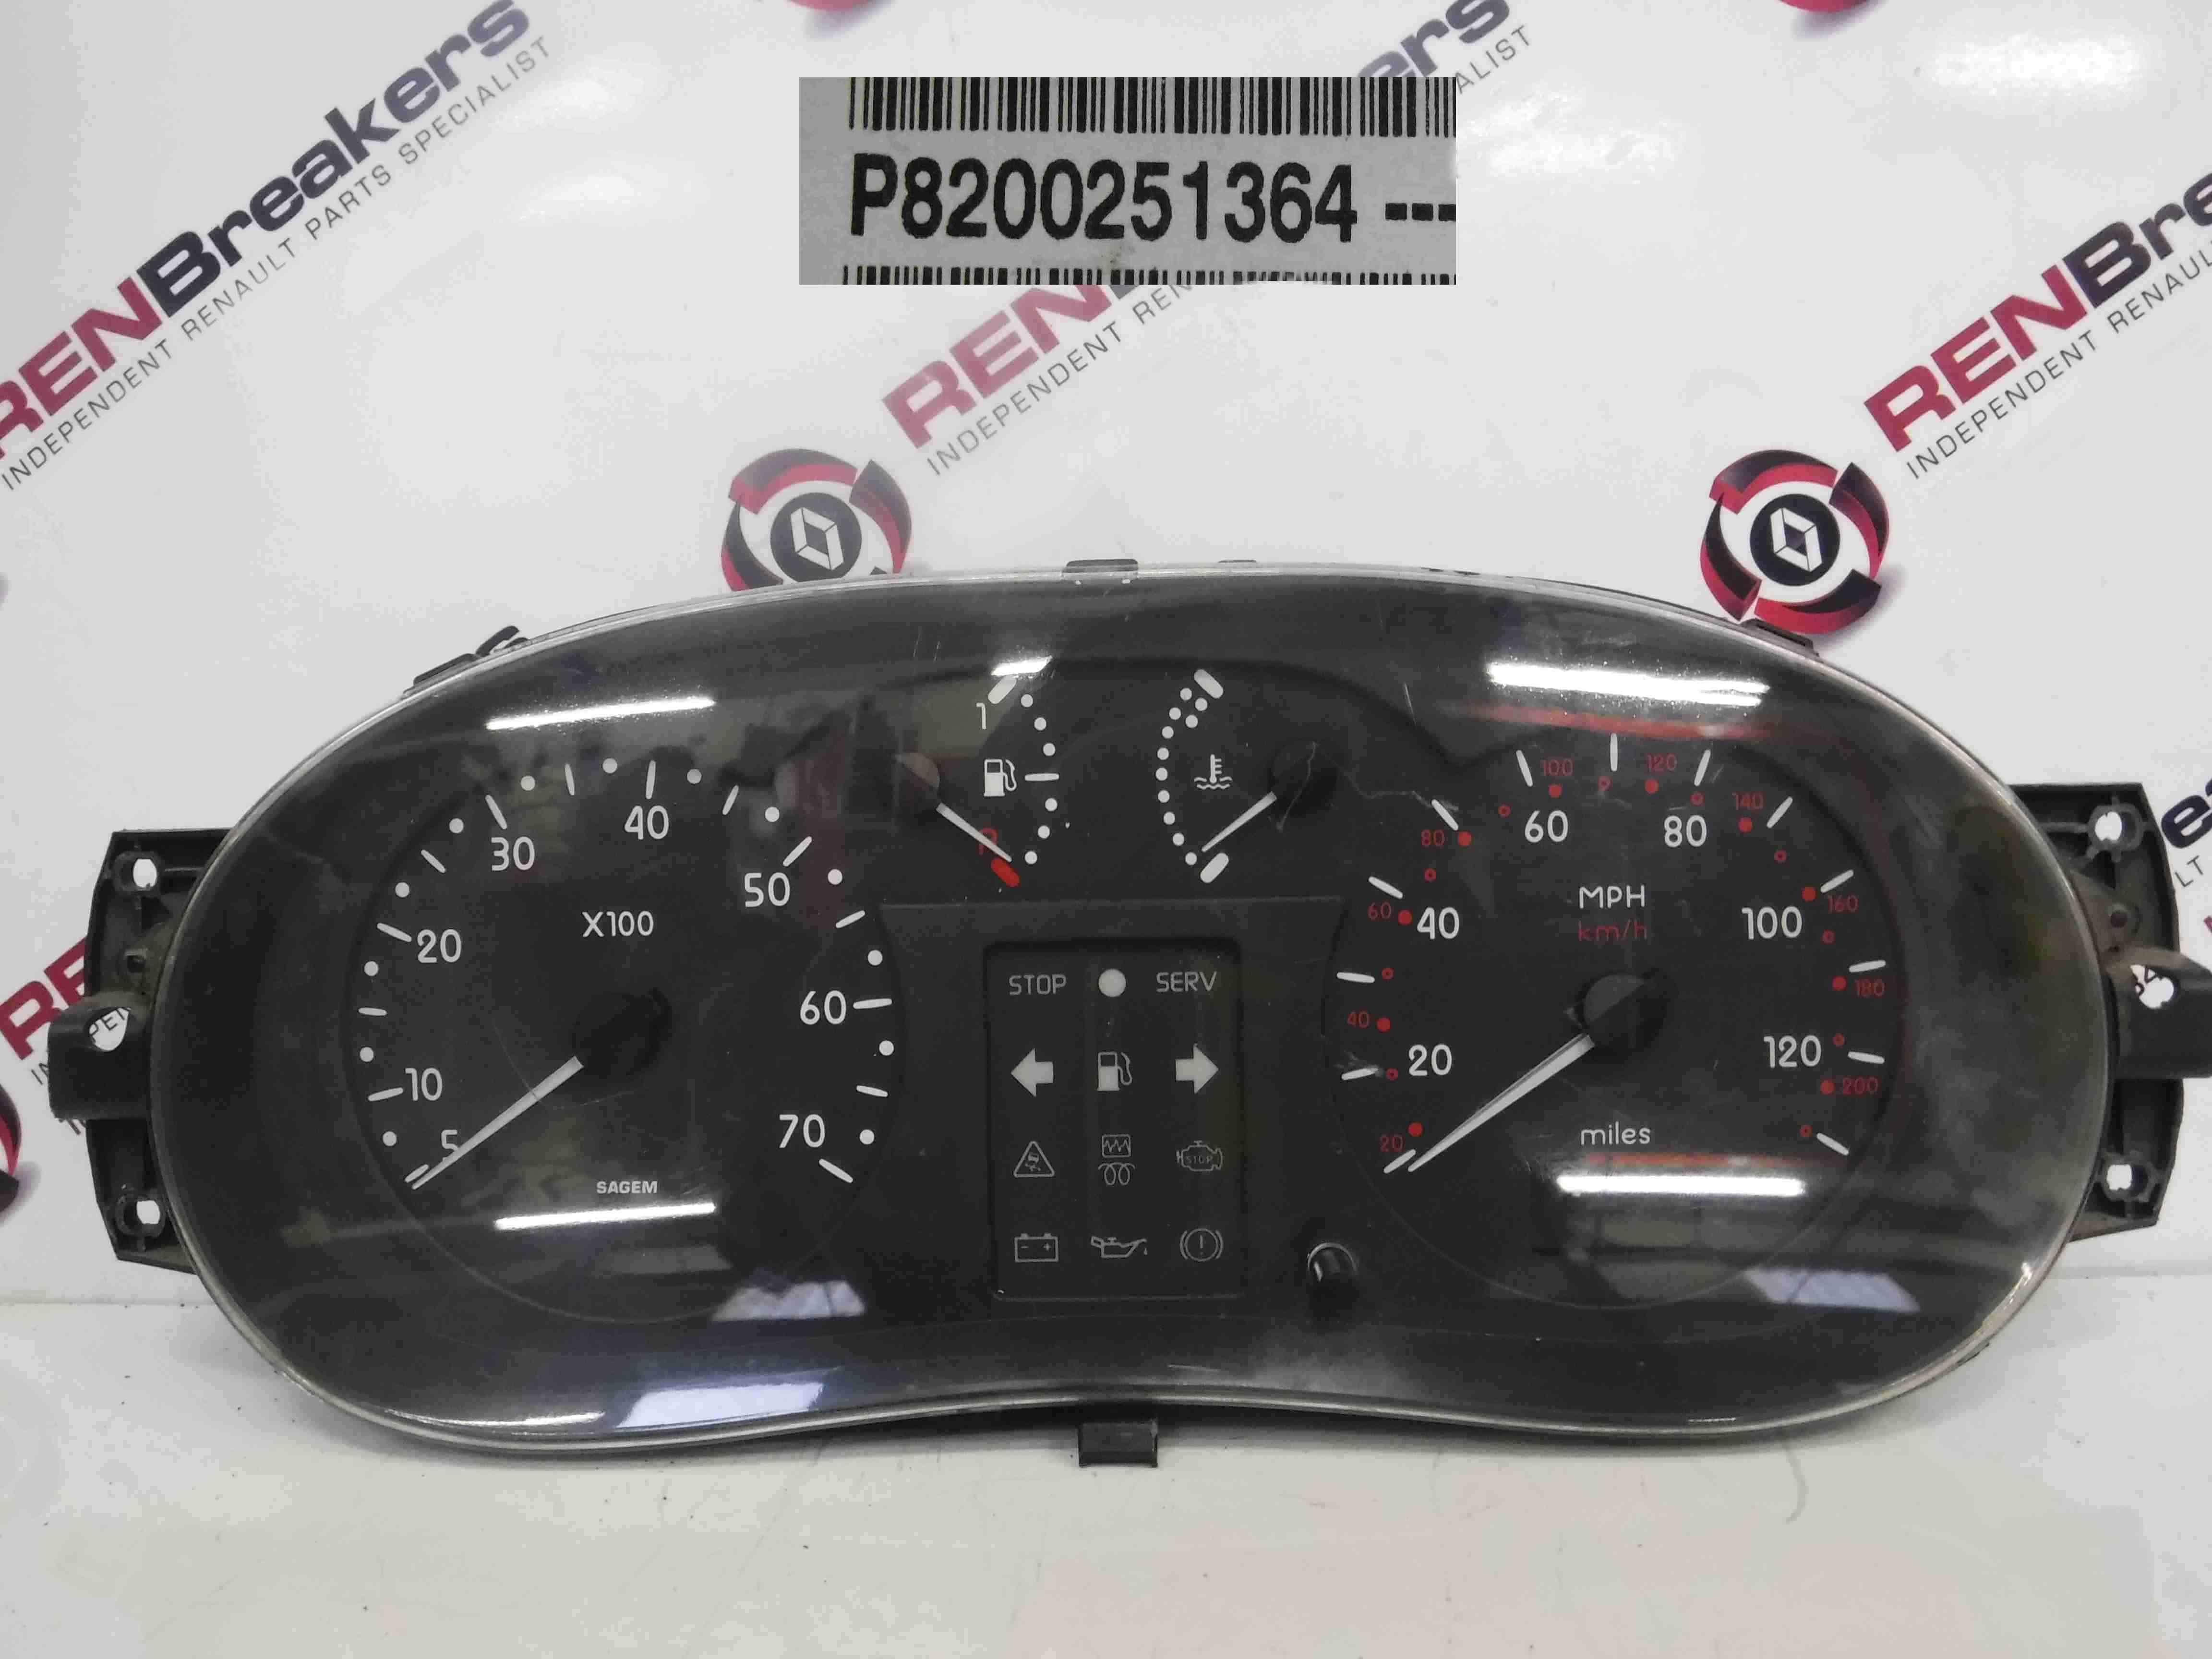 Renault Kangoo 2003-2007 Instrument Panel Dials Gauges Clocks 8200251364